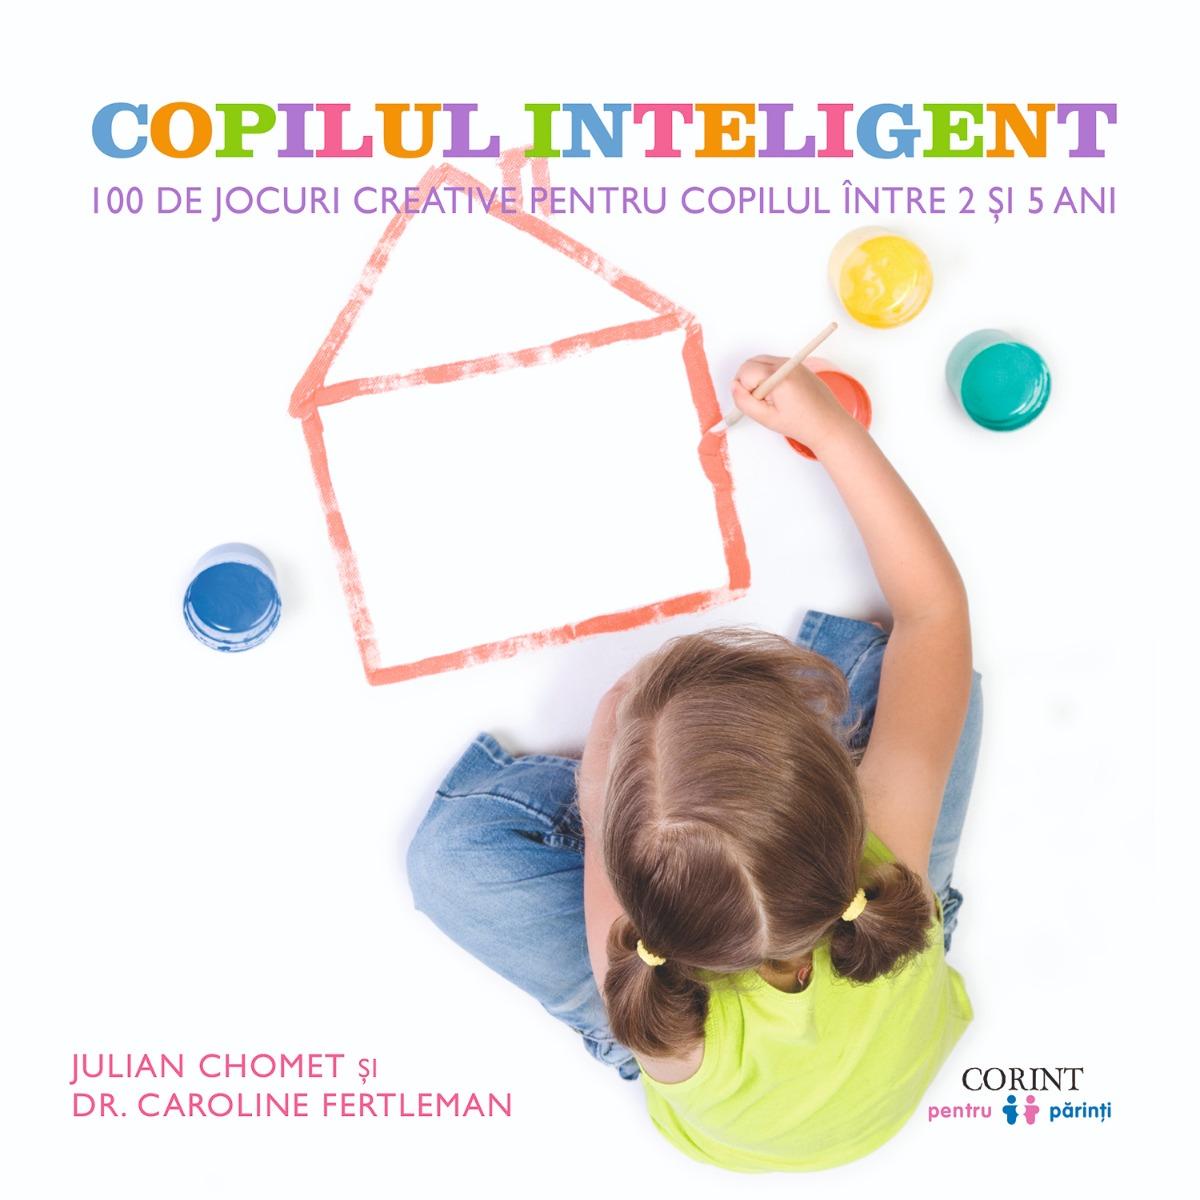 Carte Editura Corint, Copilul inteligent, Julian Chomet, Dr. Caroline Fertleman imagine 2021